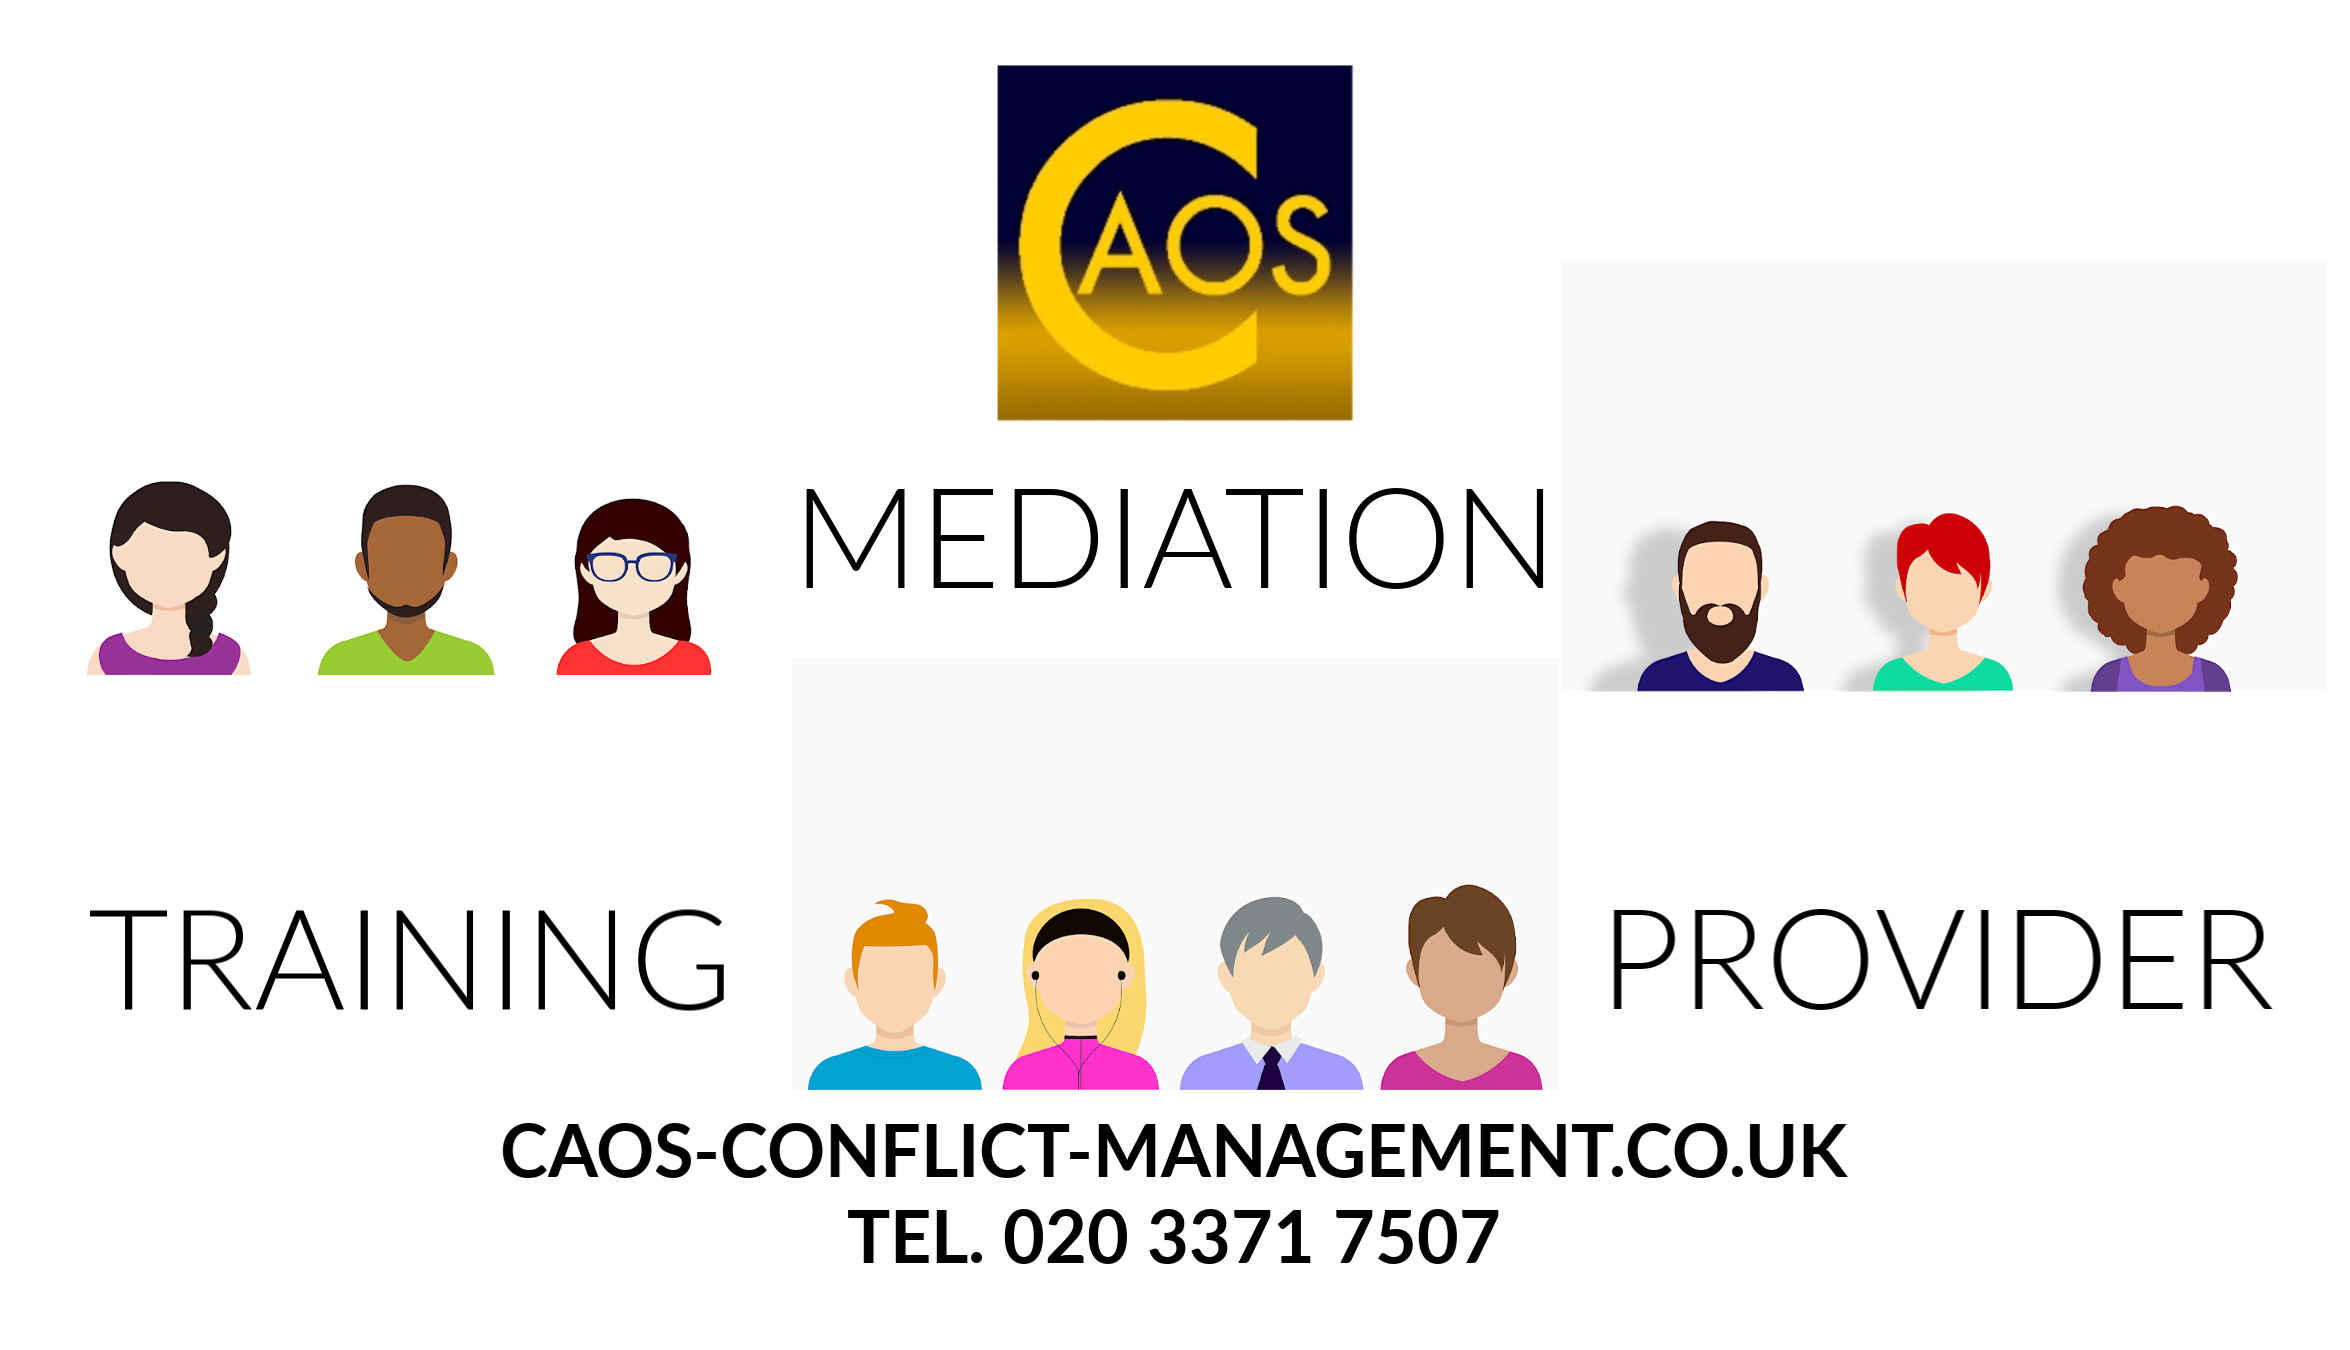 CAOS Mediation Training Provider London